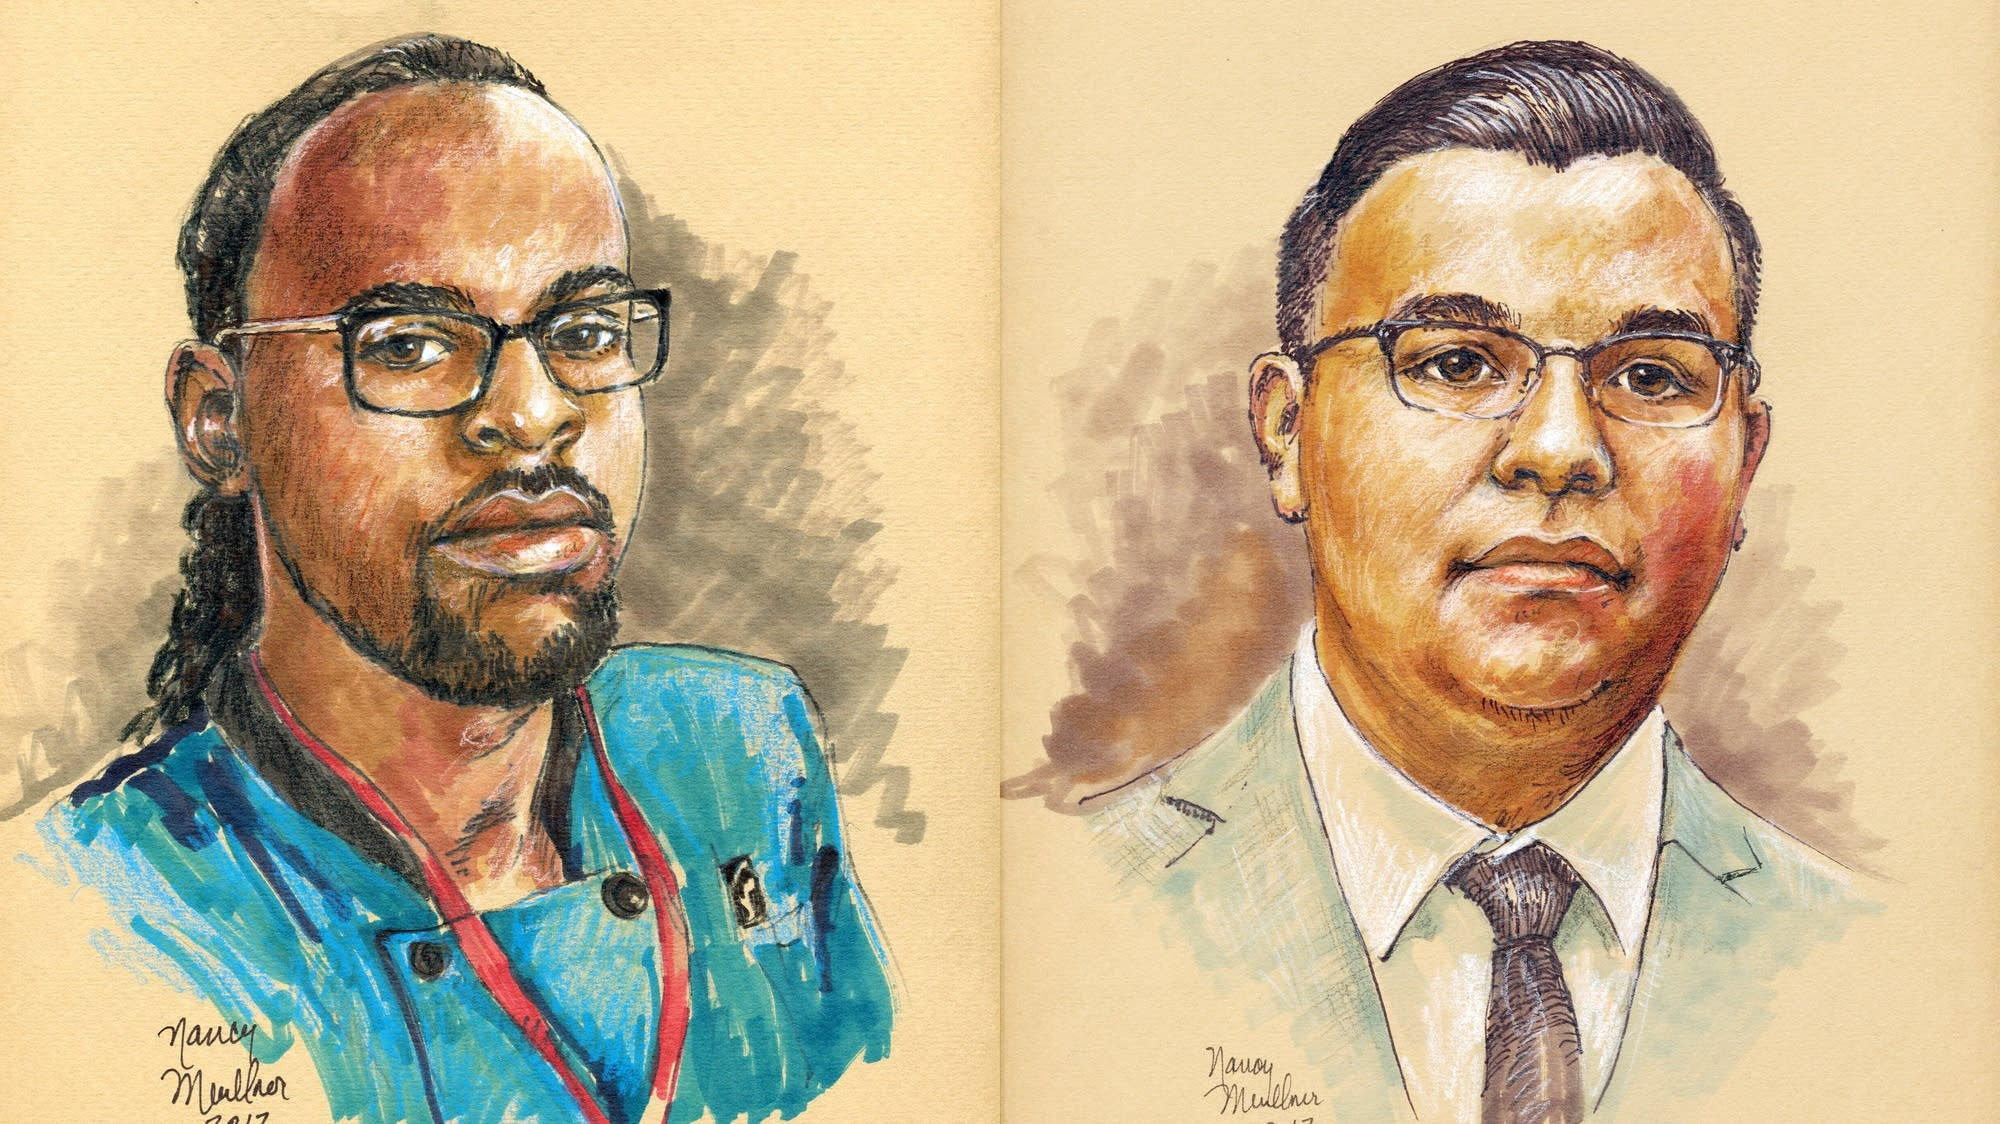 Philando Castile (left) and Jeronimo Yanez